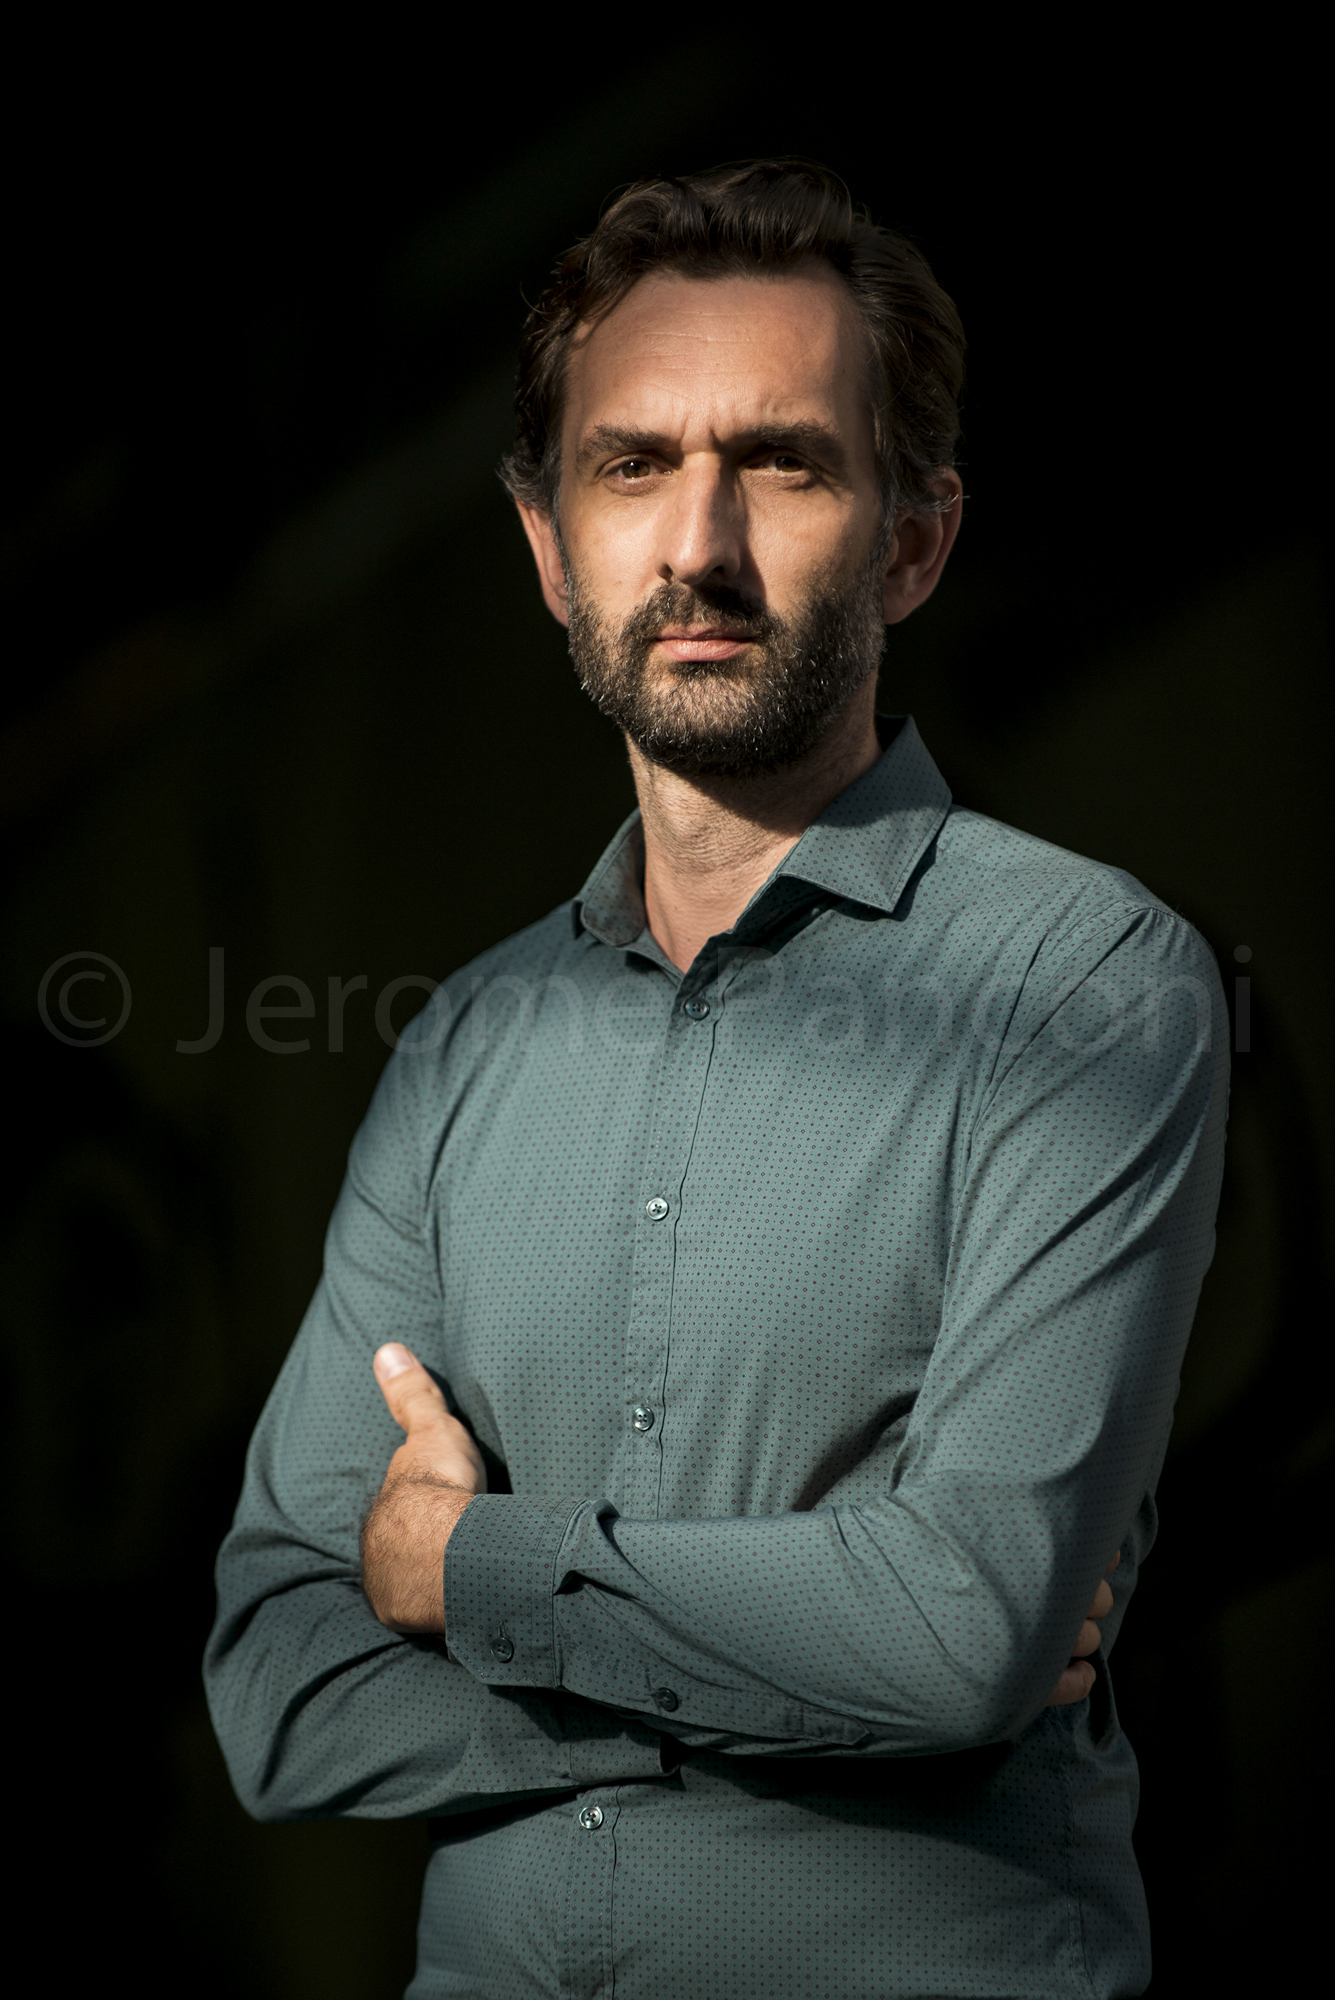 Olivier Marchon